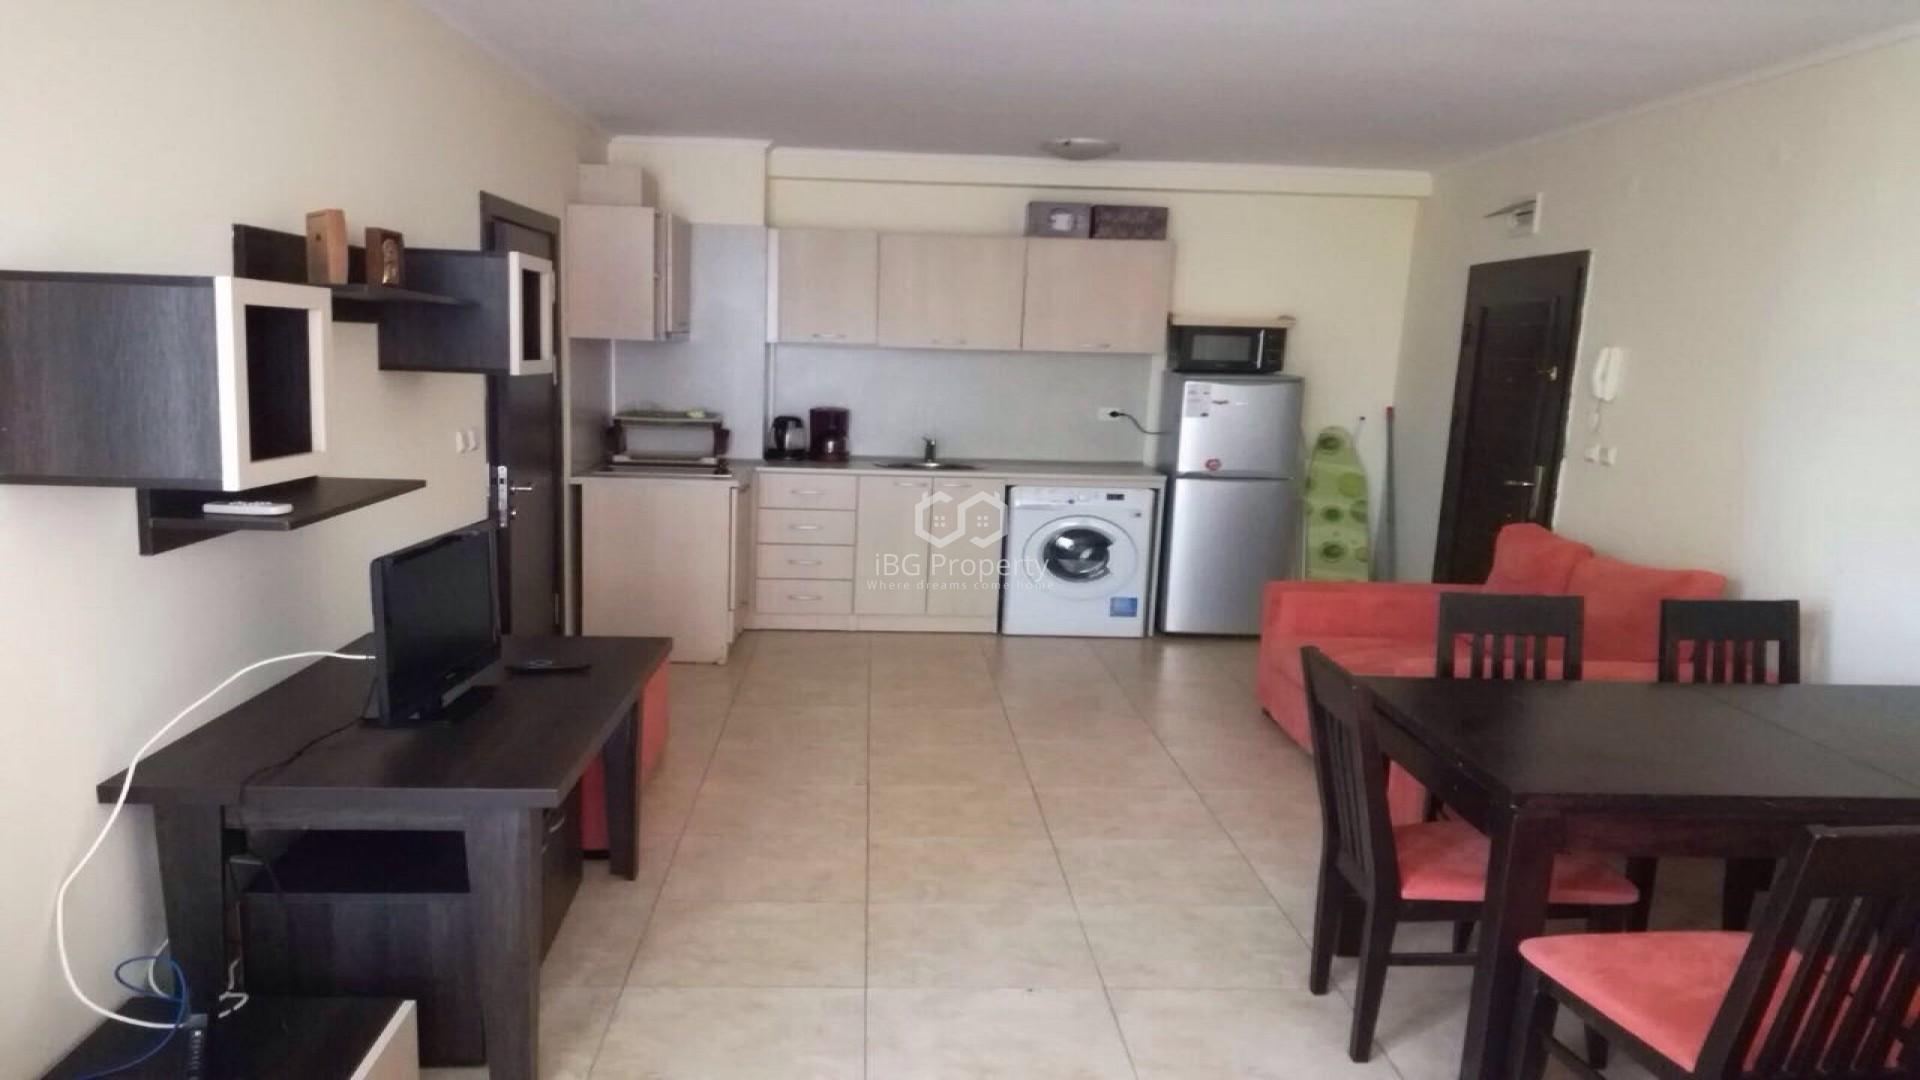 Многокомнатная квартира Равда 110 m2